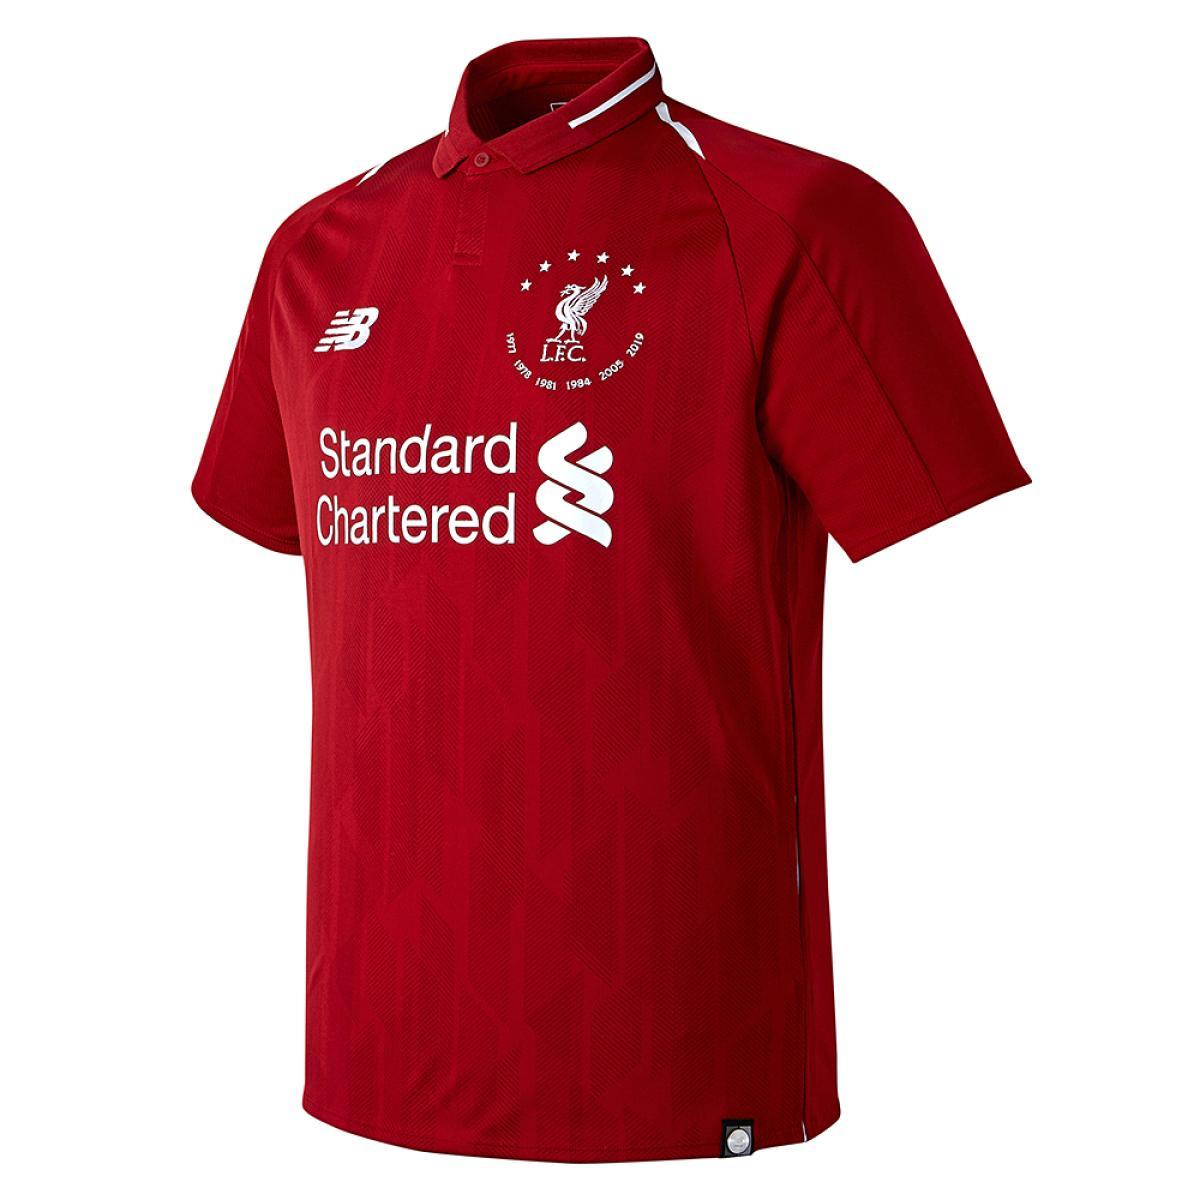 UNI 리버풀 18/19 홈 기념 시그니처 유니폼